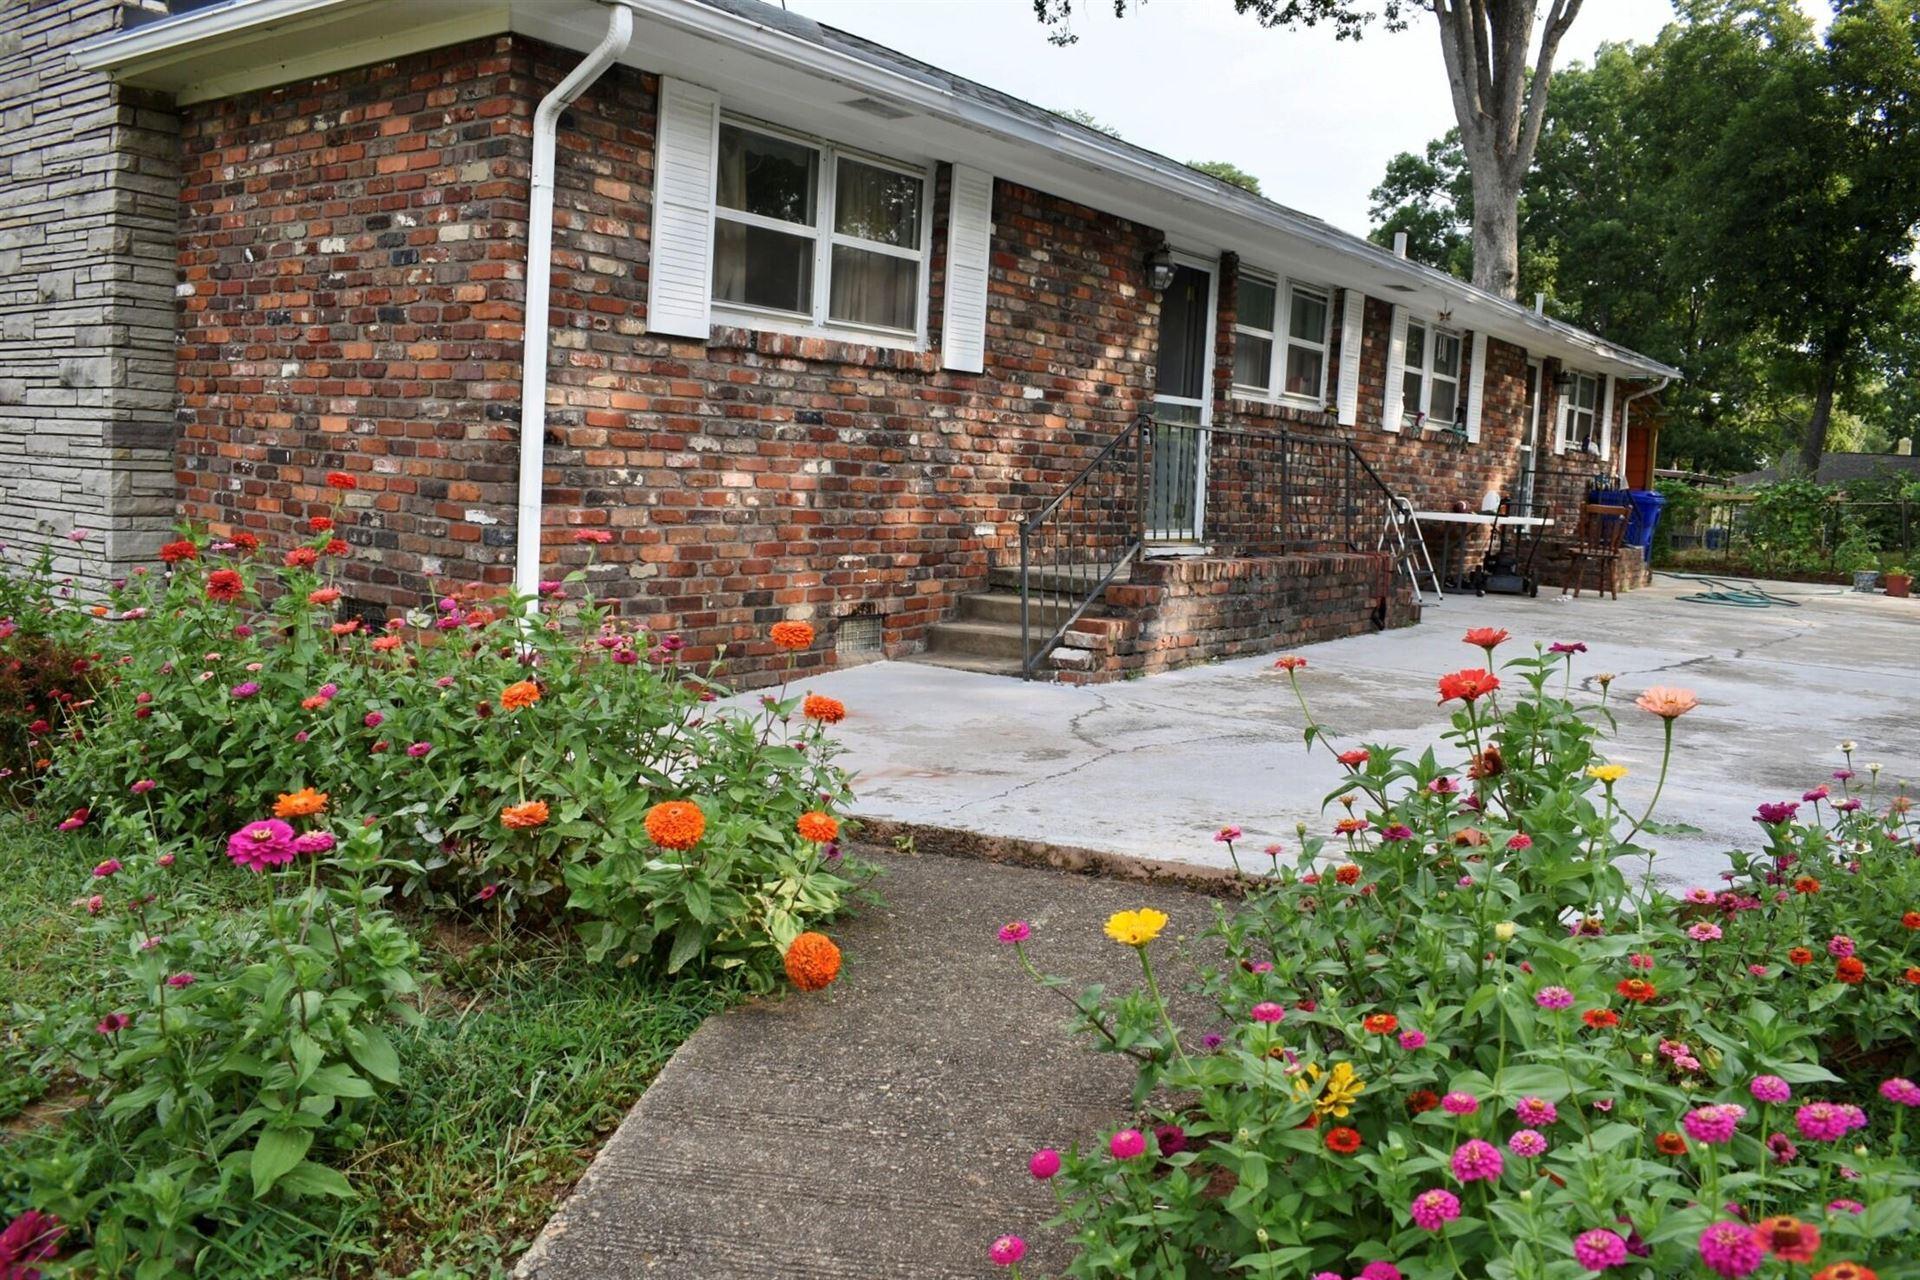 Photo of 115 Northwestern Ave, Oak Ridge, TN 37830 (MLS # 1162326)